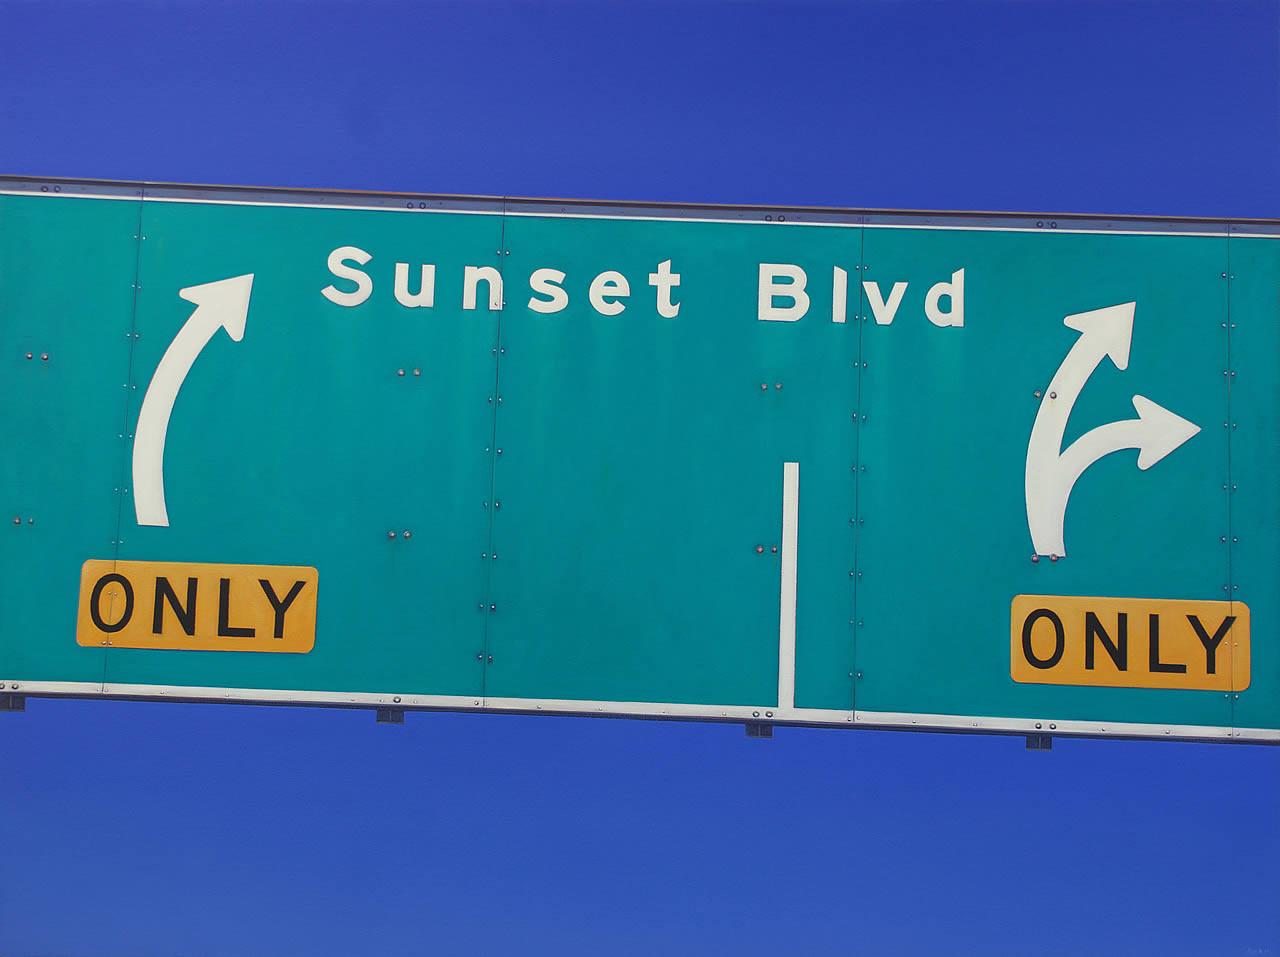 Sunset Blvd Only